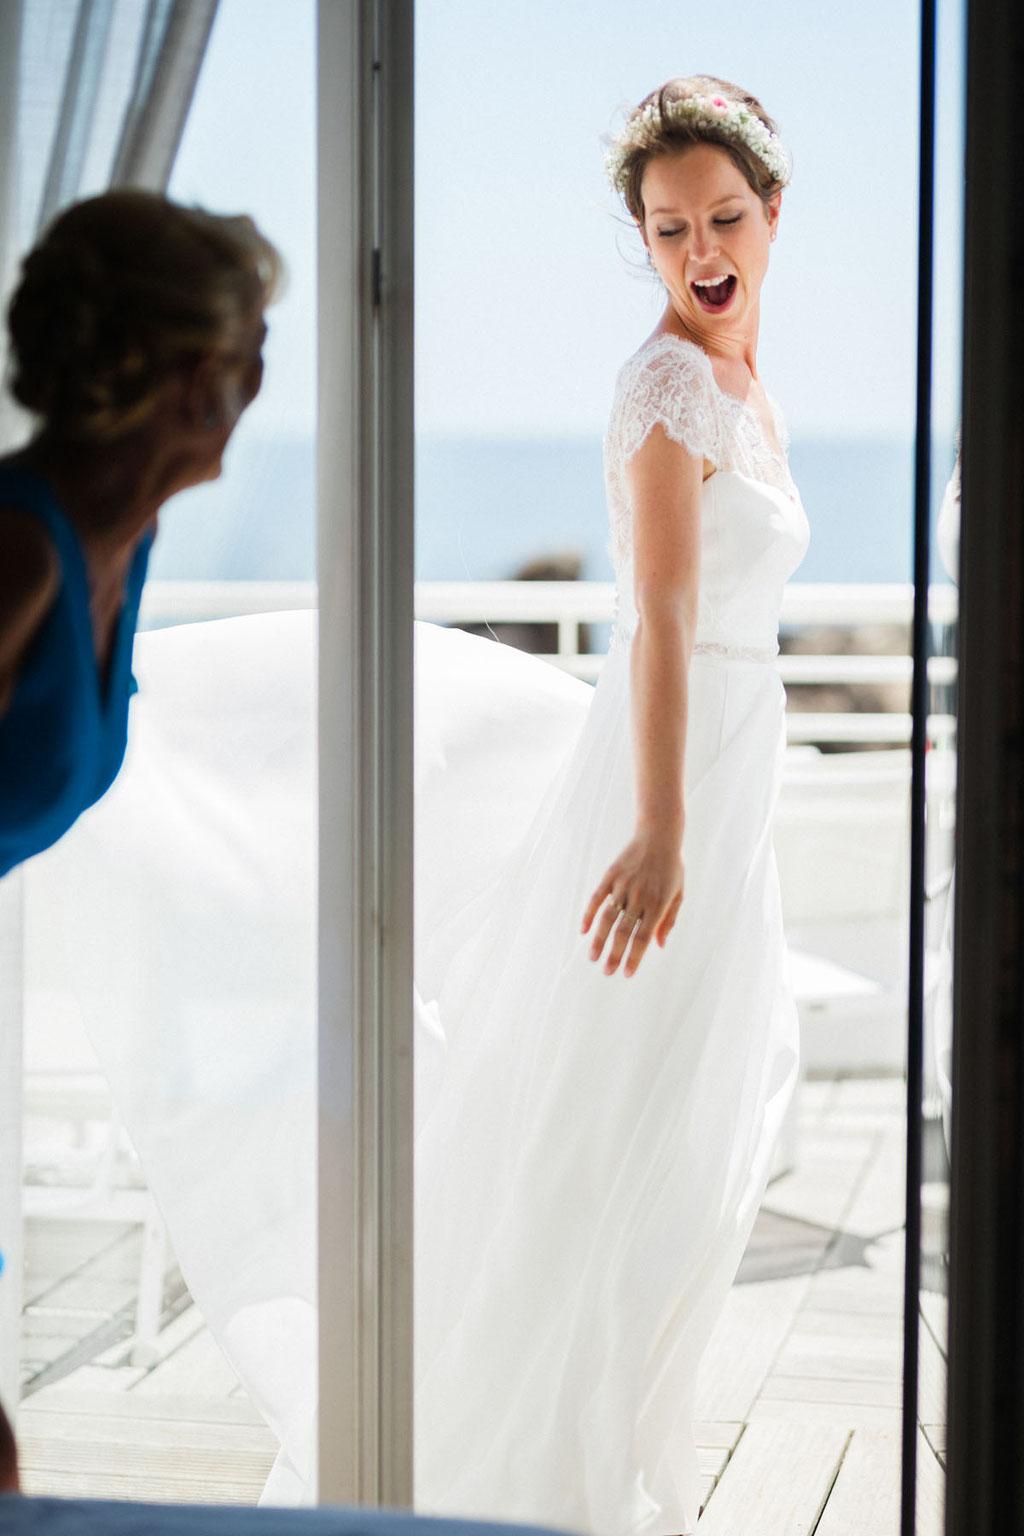 photographe pornic mariage Orlane Boisard orlane-photos.com